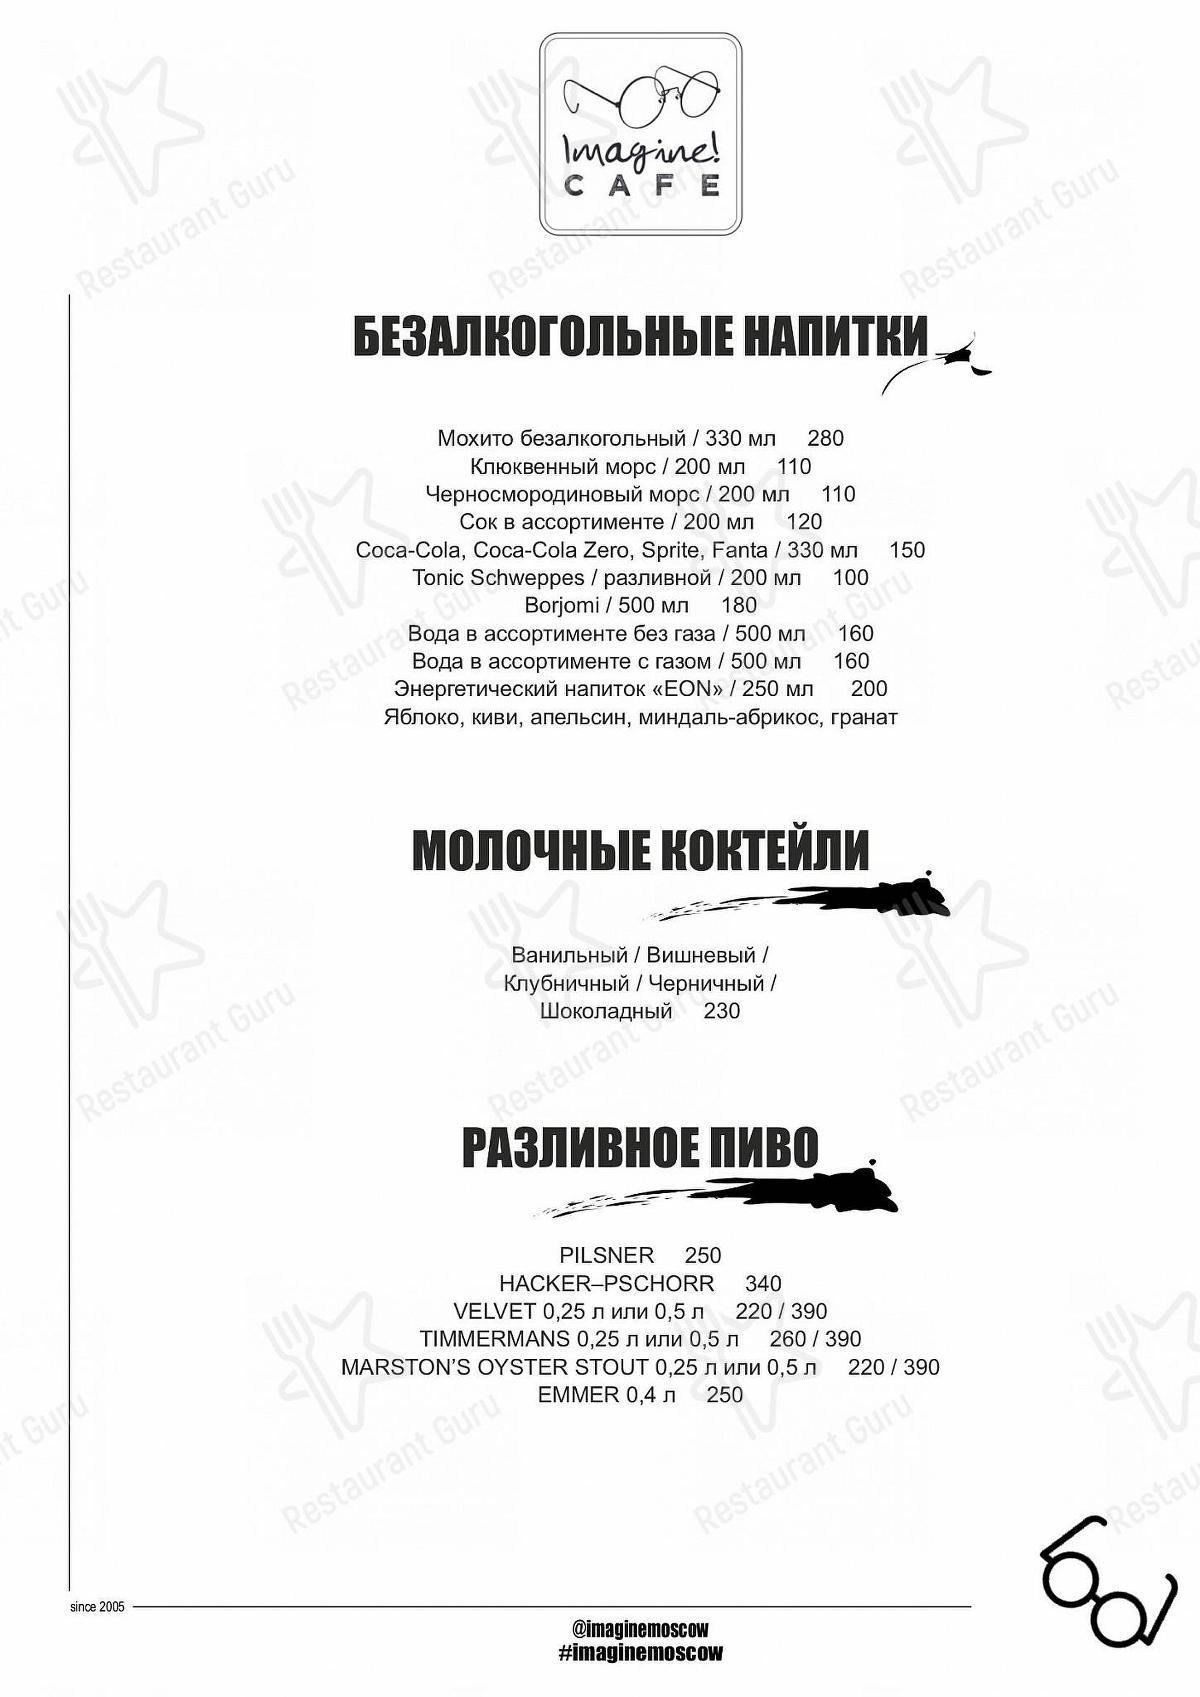 Imagine Cafe menu - meals and drinks